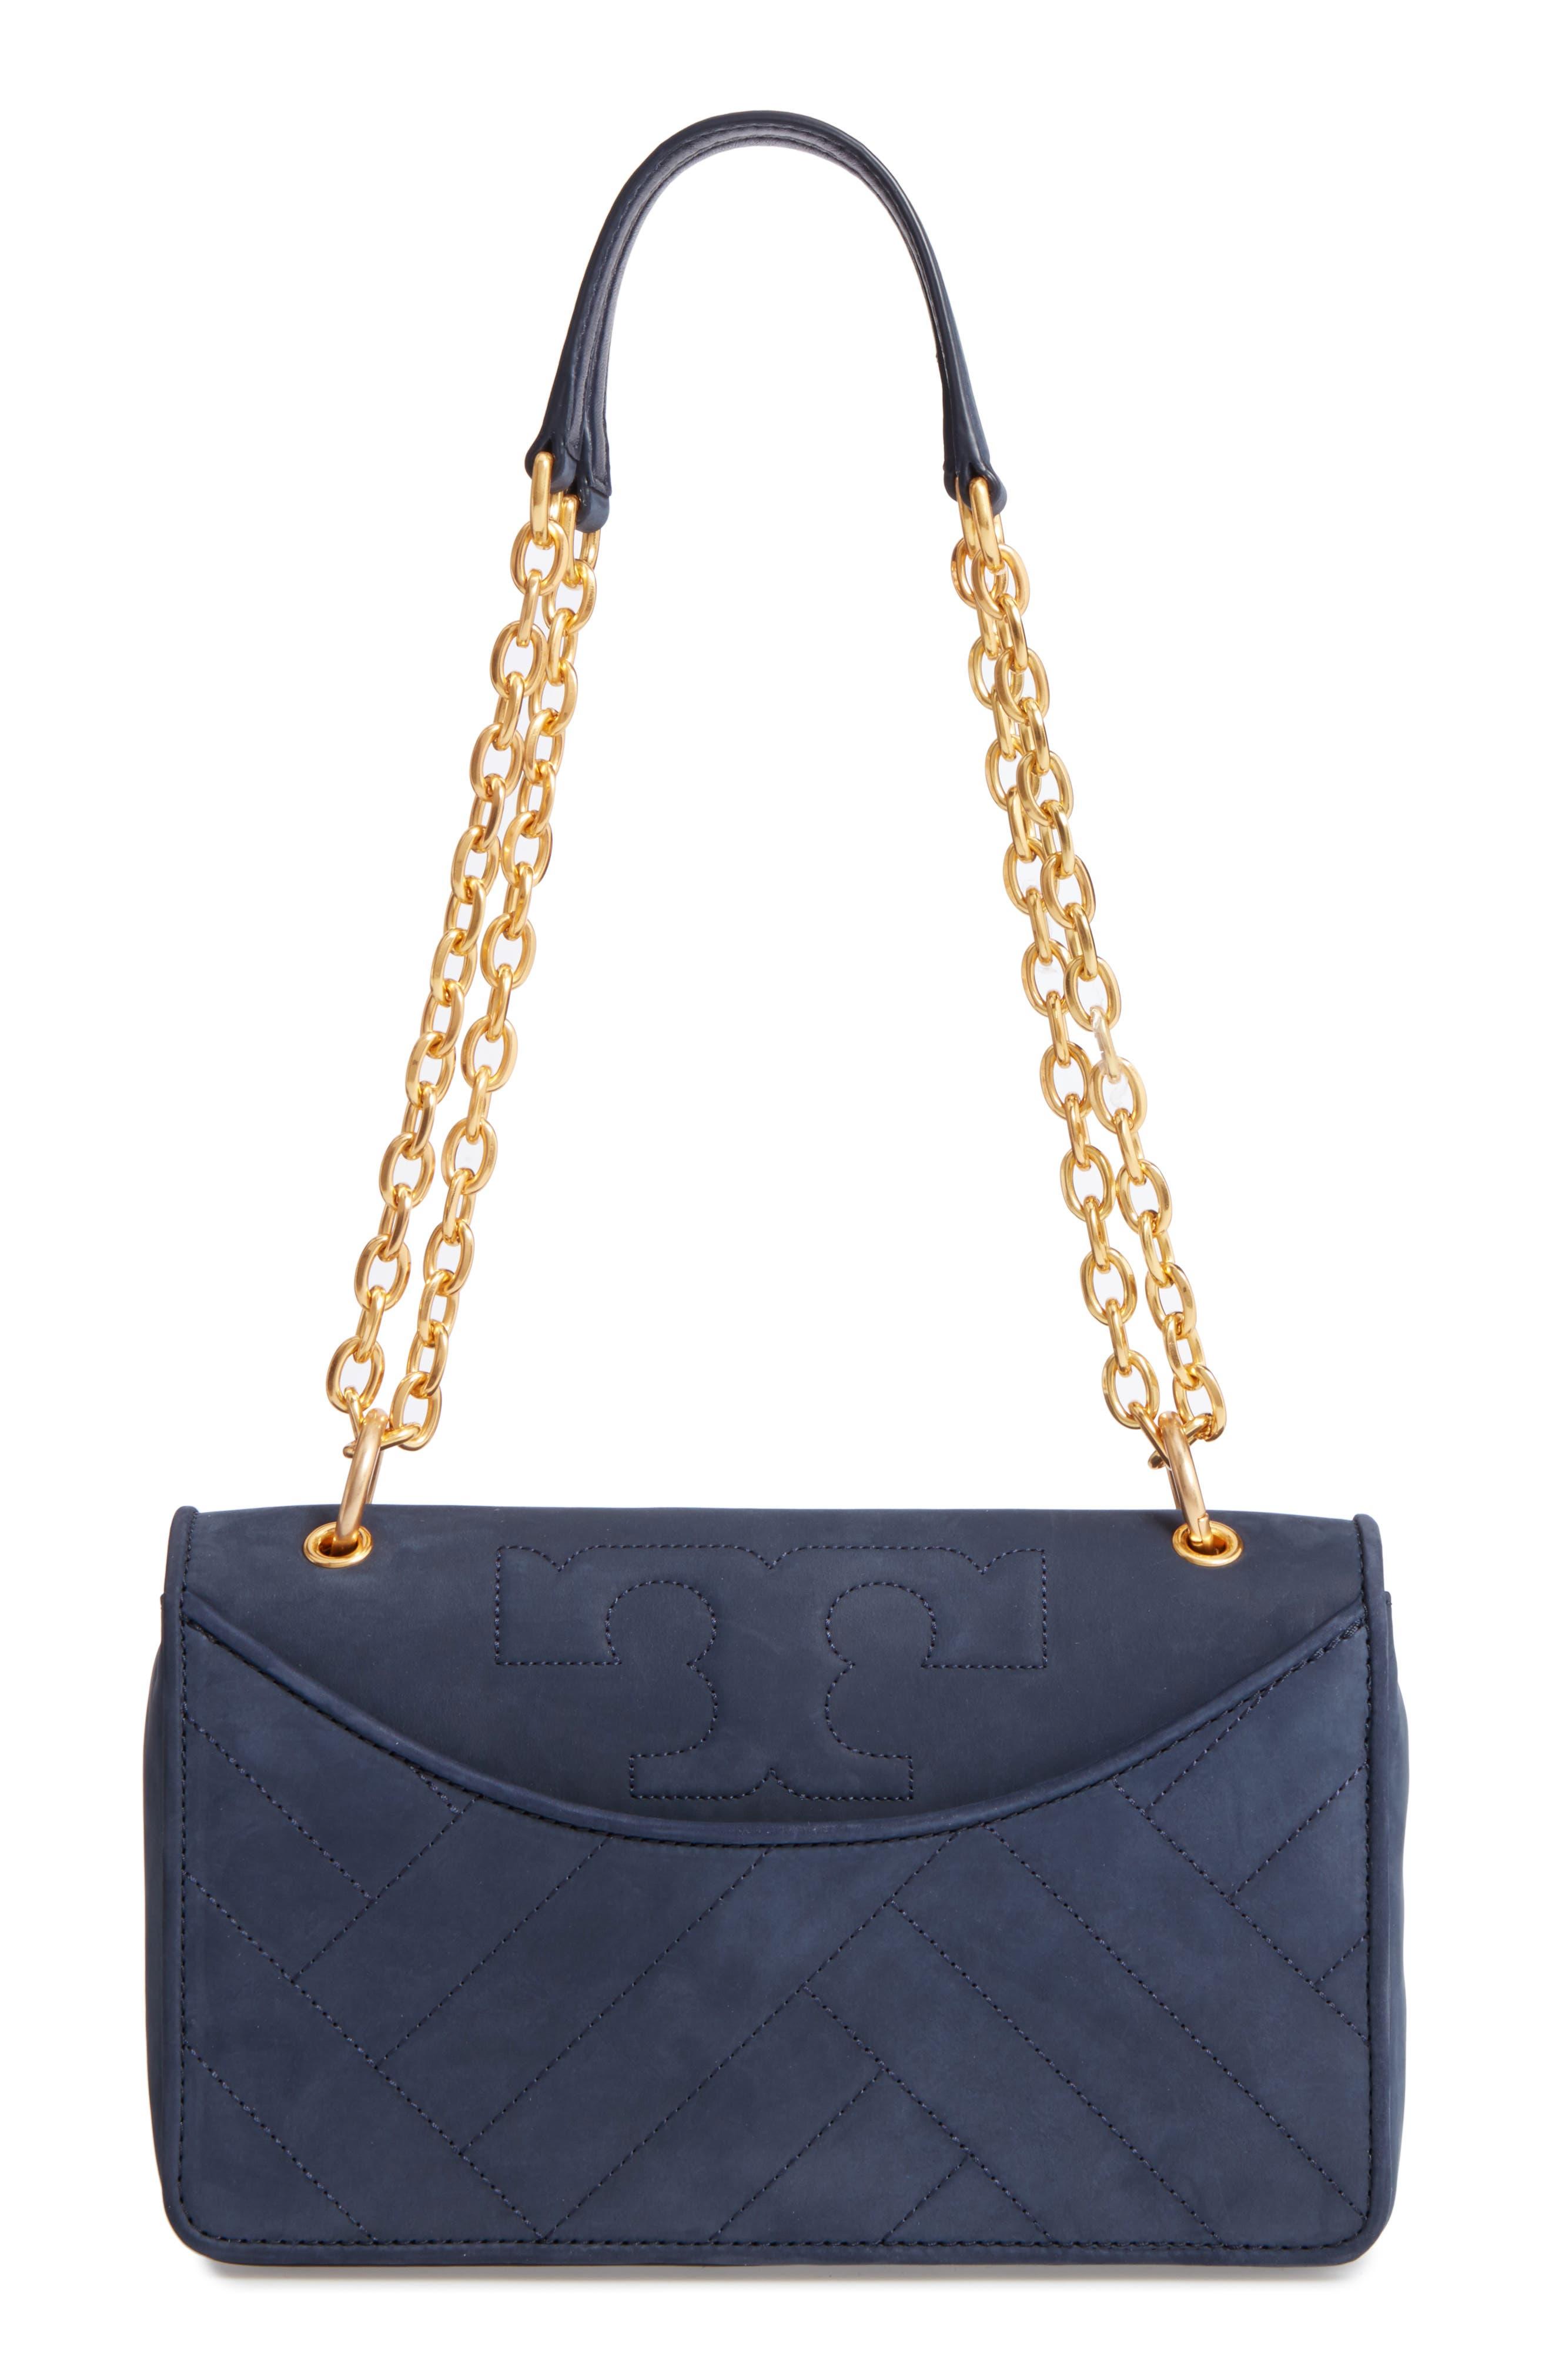 Alternate Image 1 Selected - Tory Burch Alexa Leather Shoulder Bag